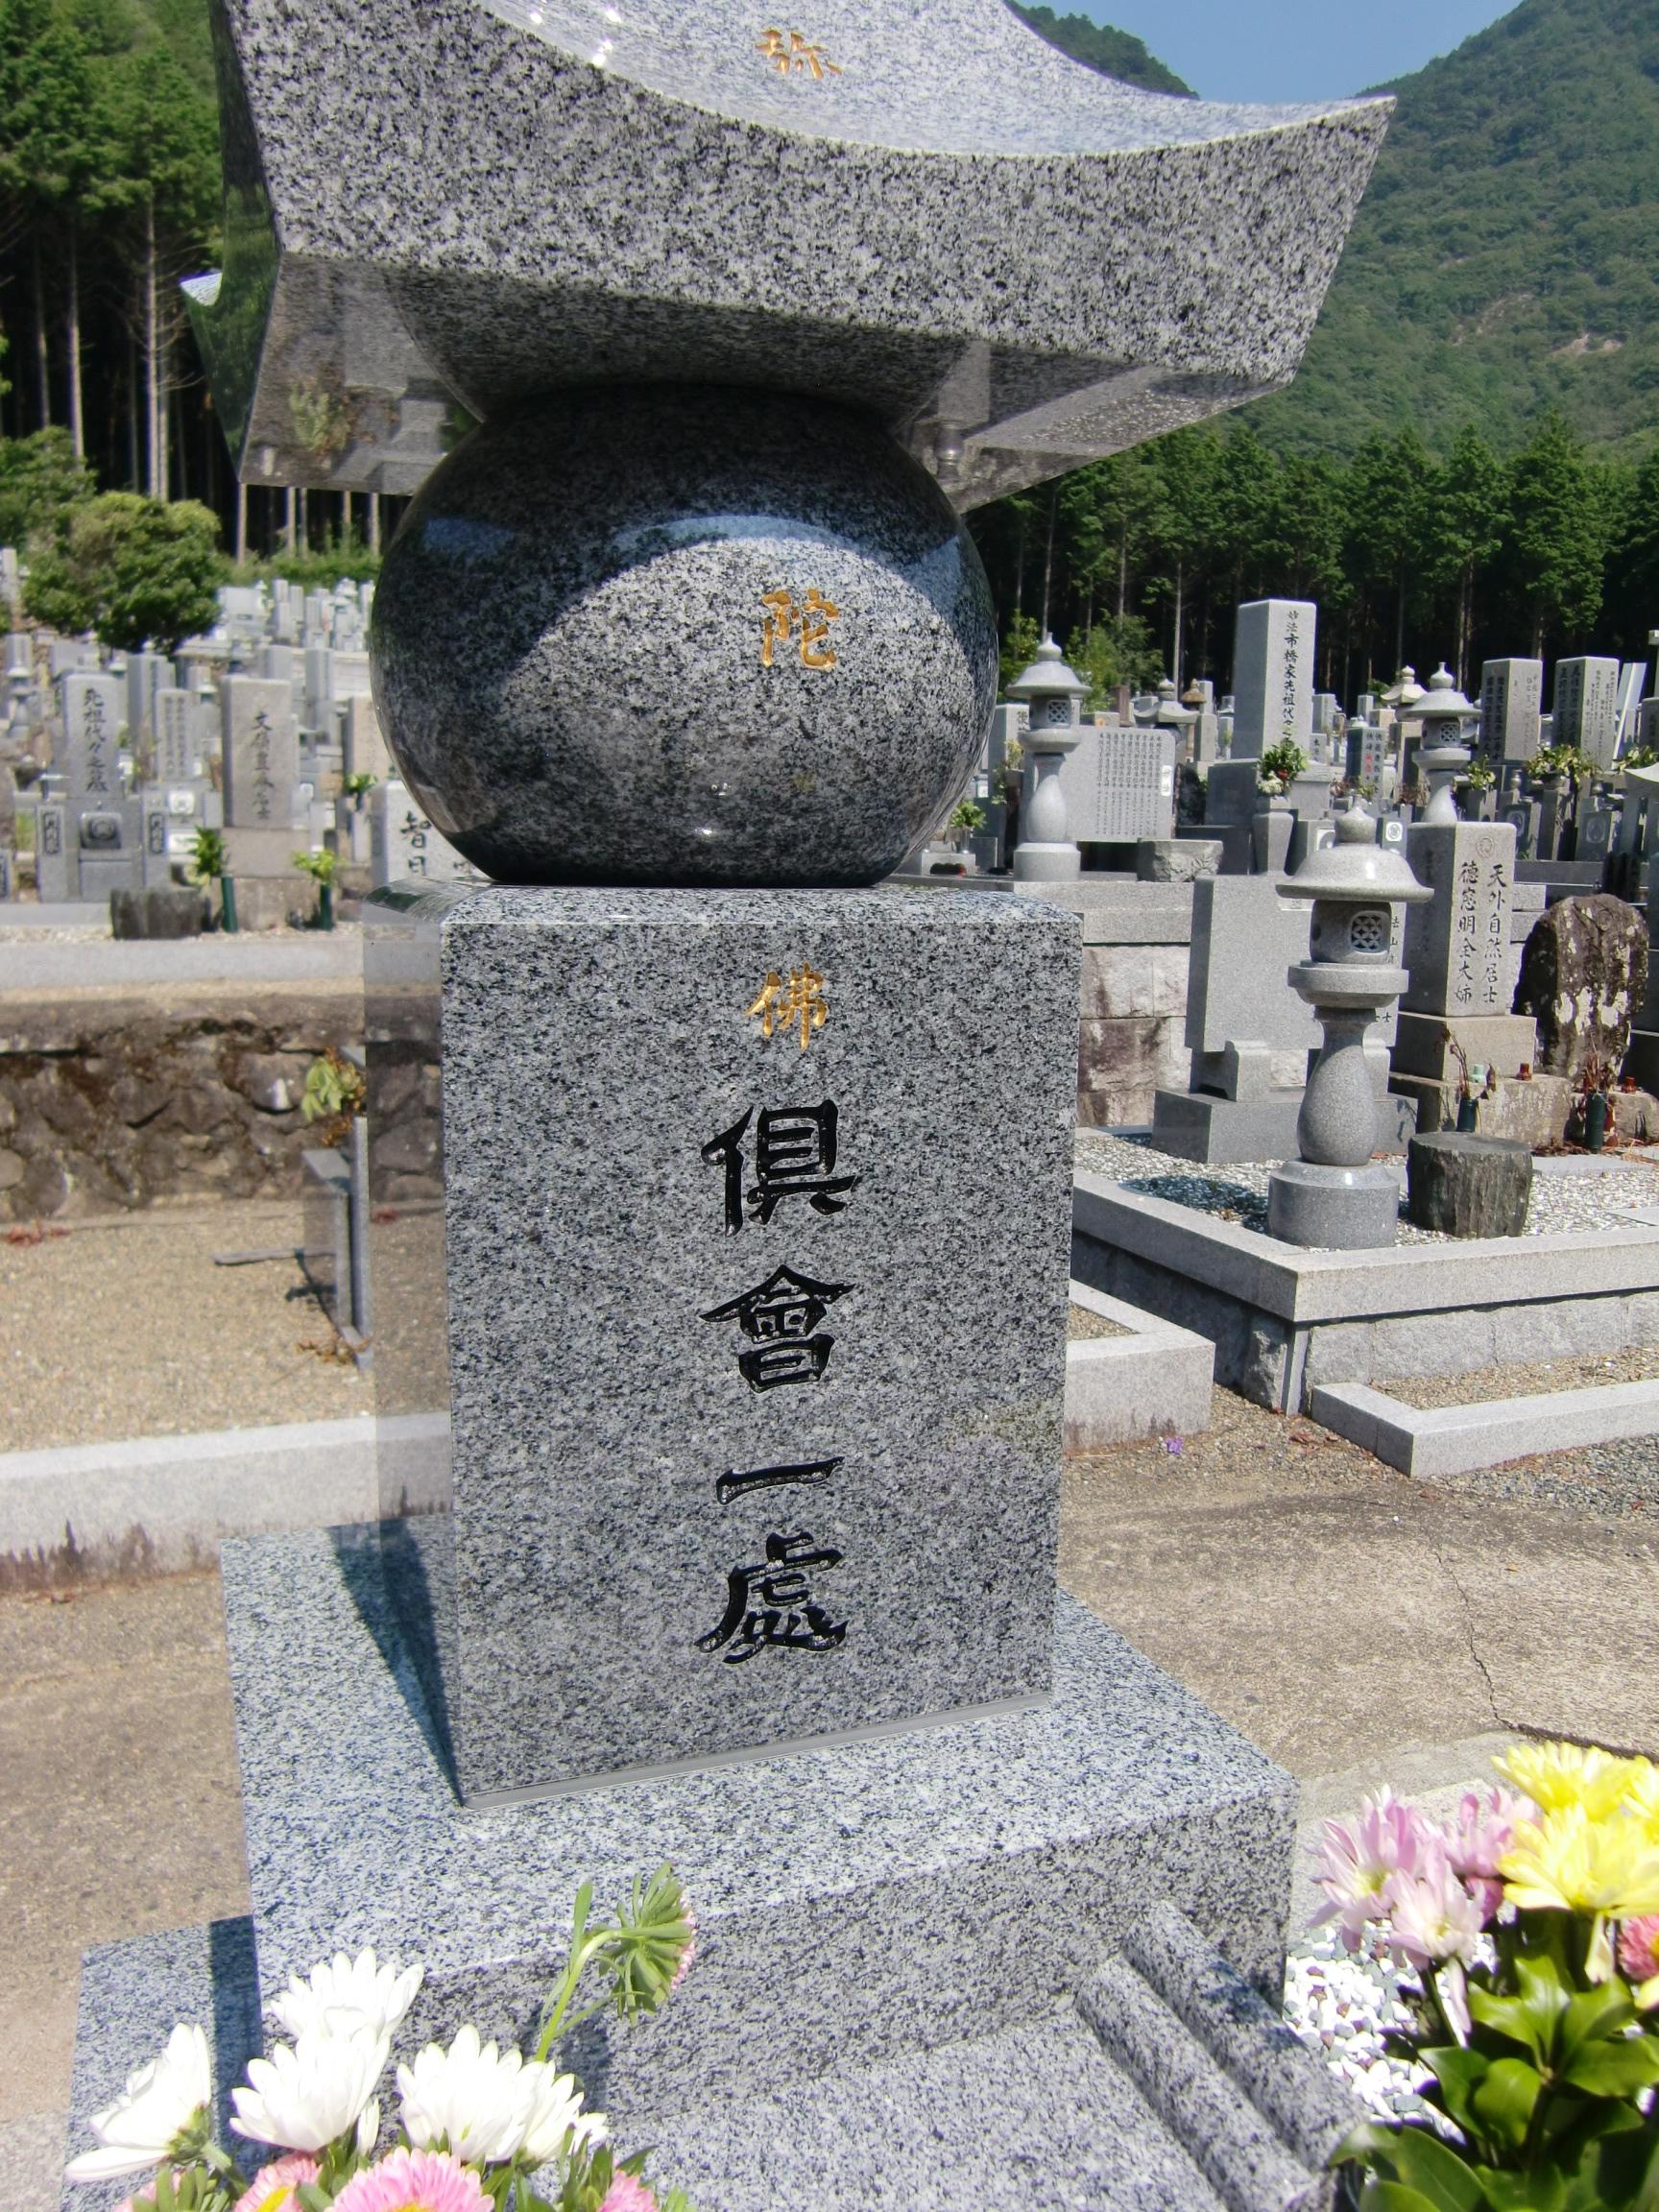 https://www.morita-stone.co.jp/weblog/img/12.28%E3%80%80%E6%96%87%E5%AD%973.JPG